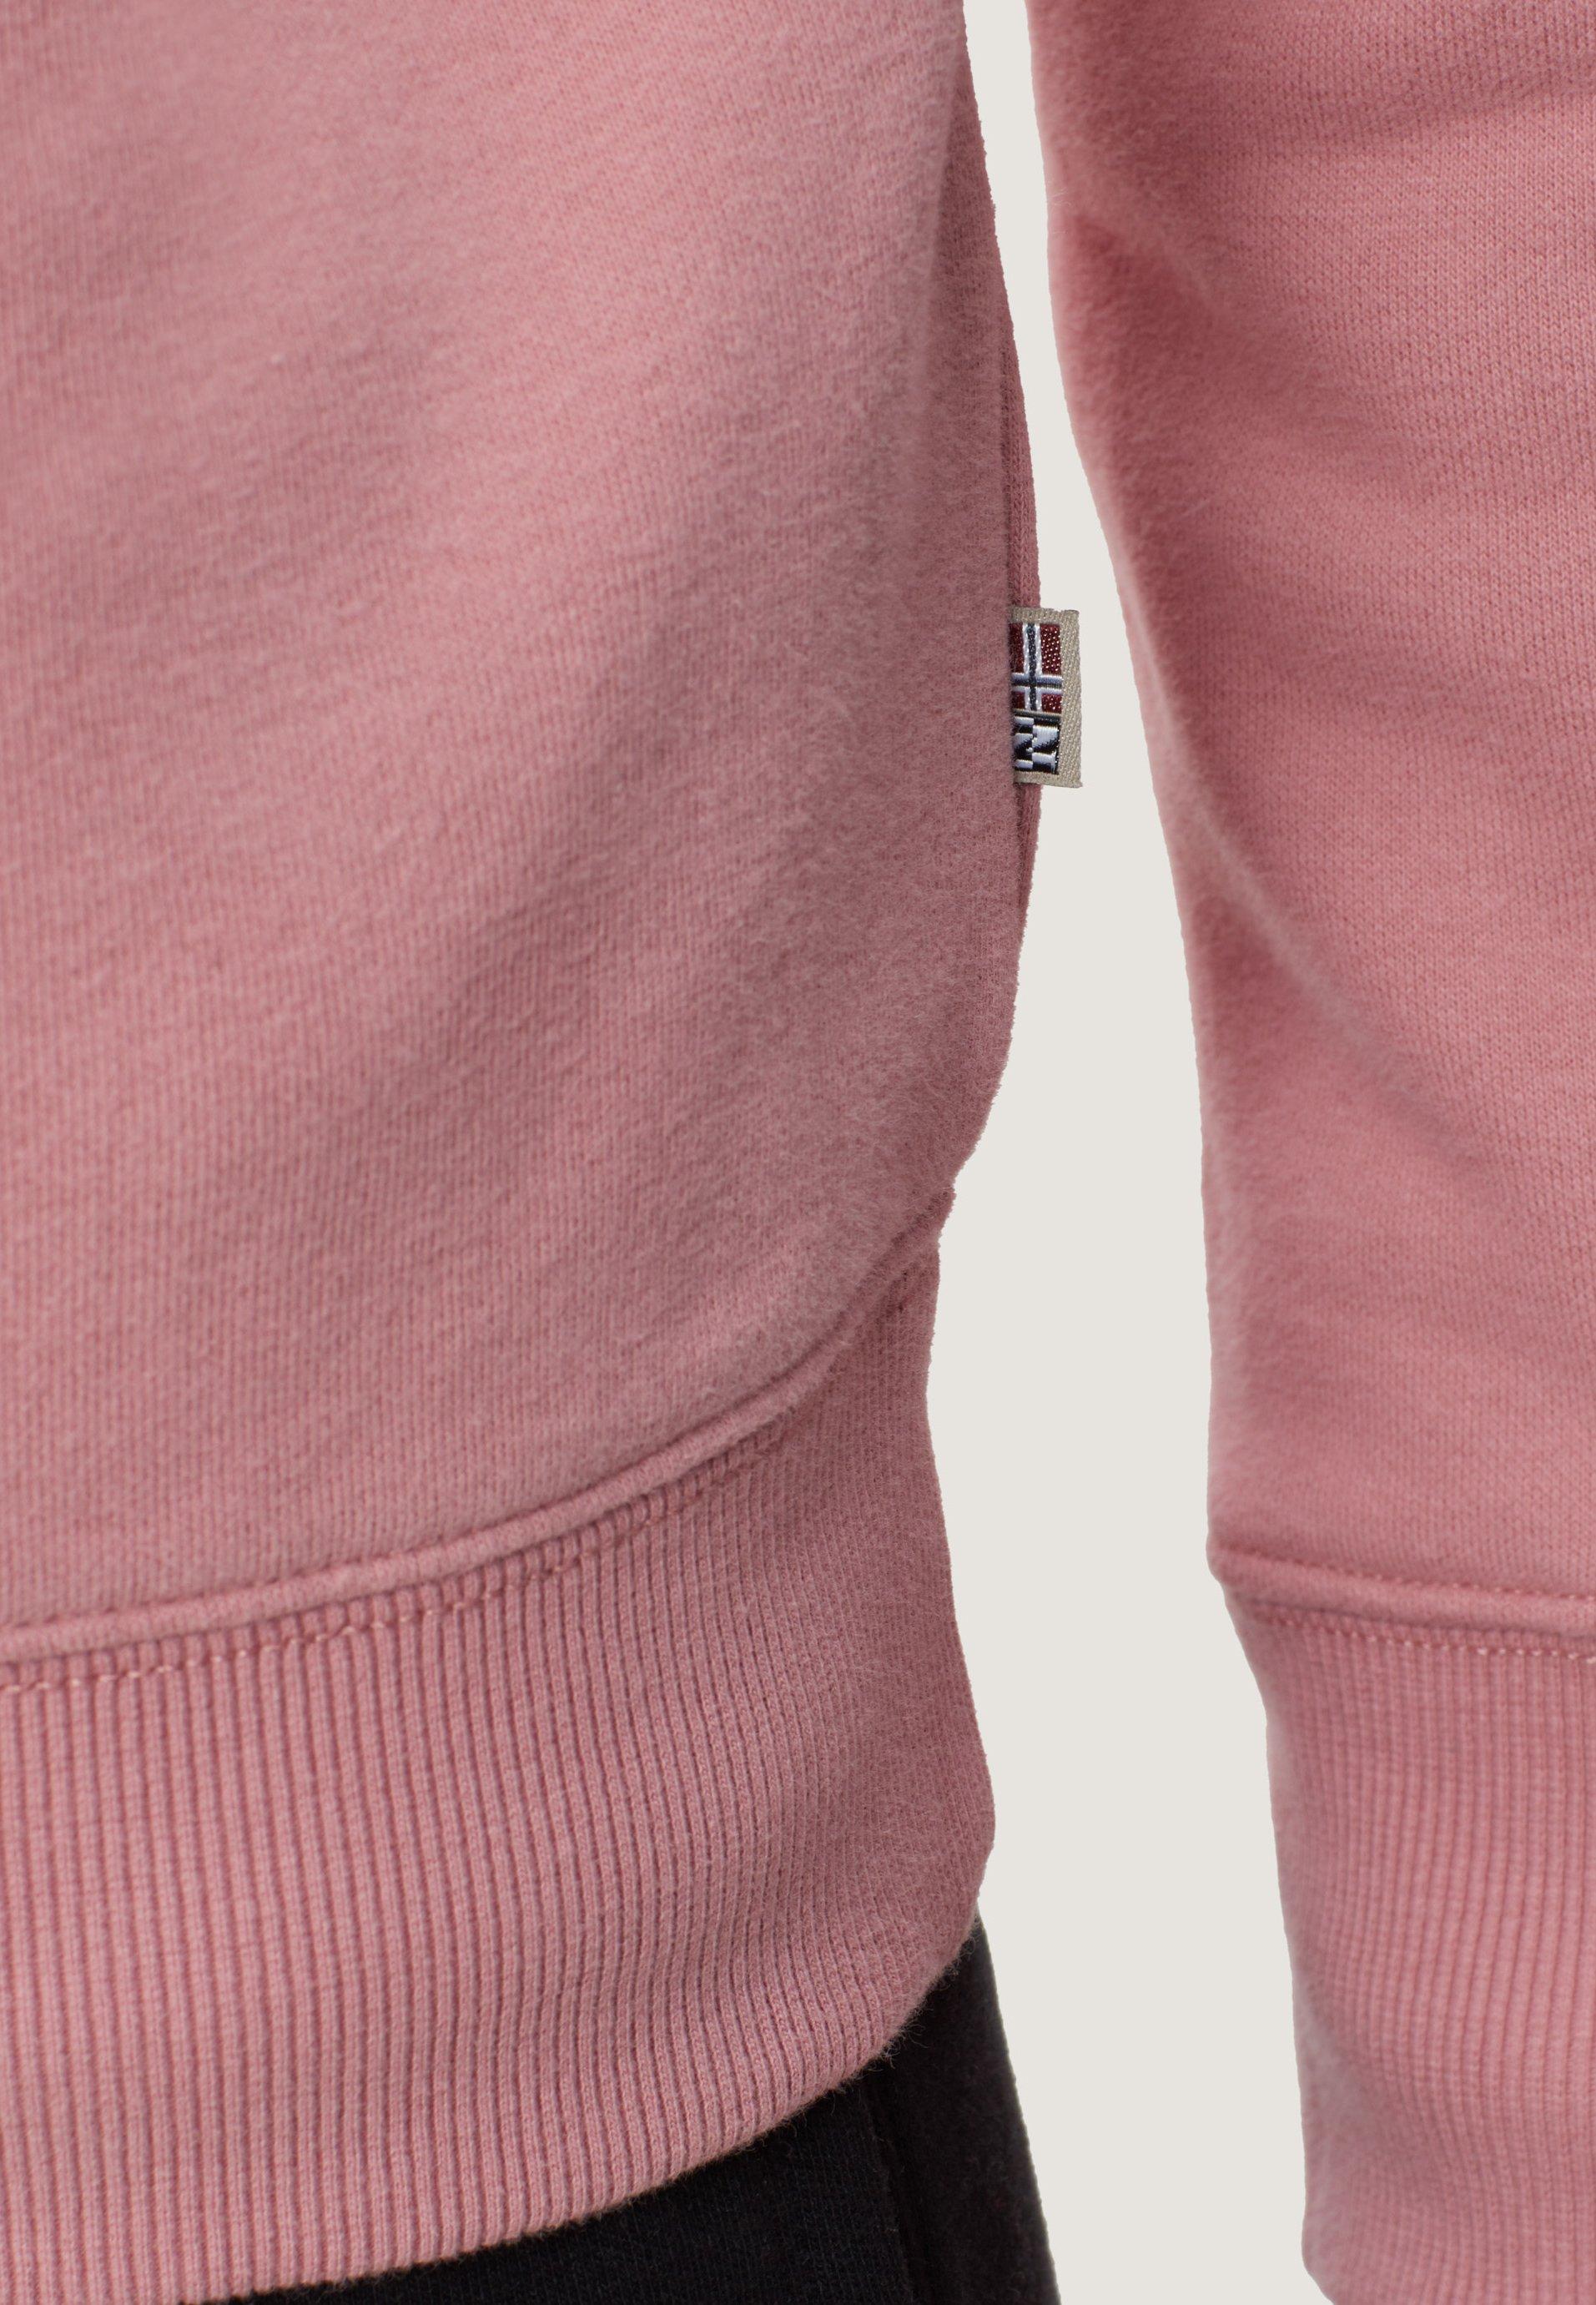 Napapijri Sweatshirt - pink blush